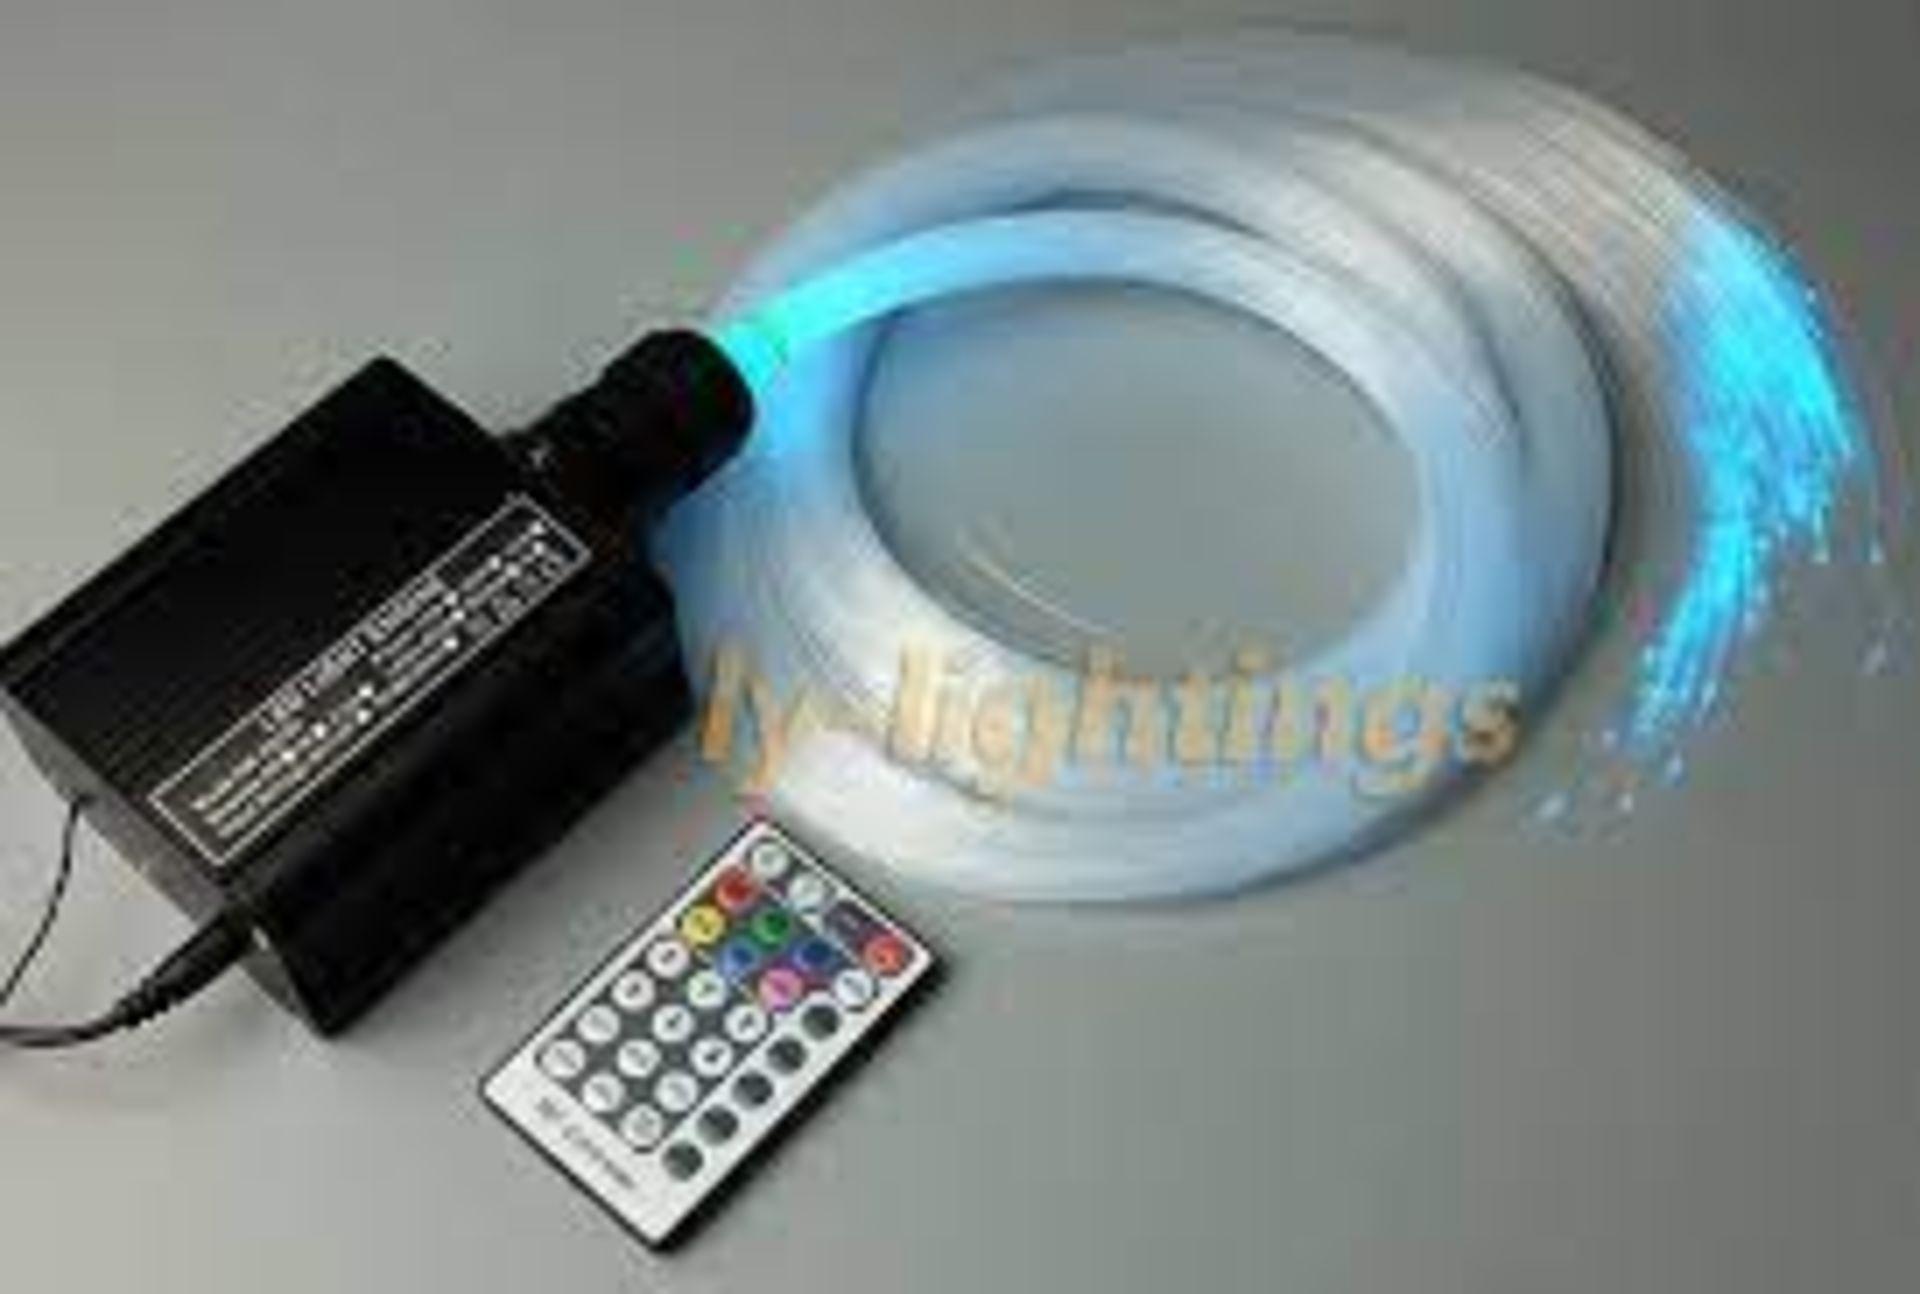 (3F) Fibre Optic / LED Lighting Lot. To Include 1x Optic Lighting InFloor Fibre Optic Lighting Kit.